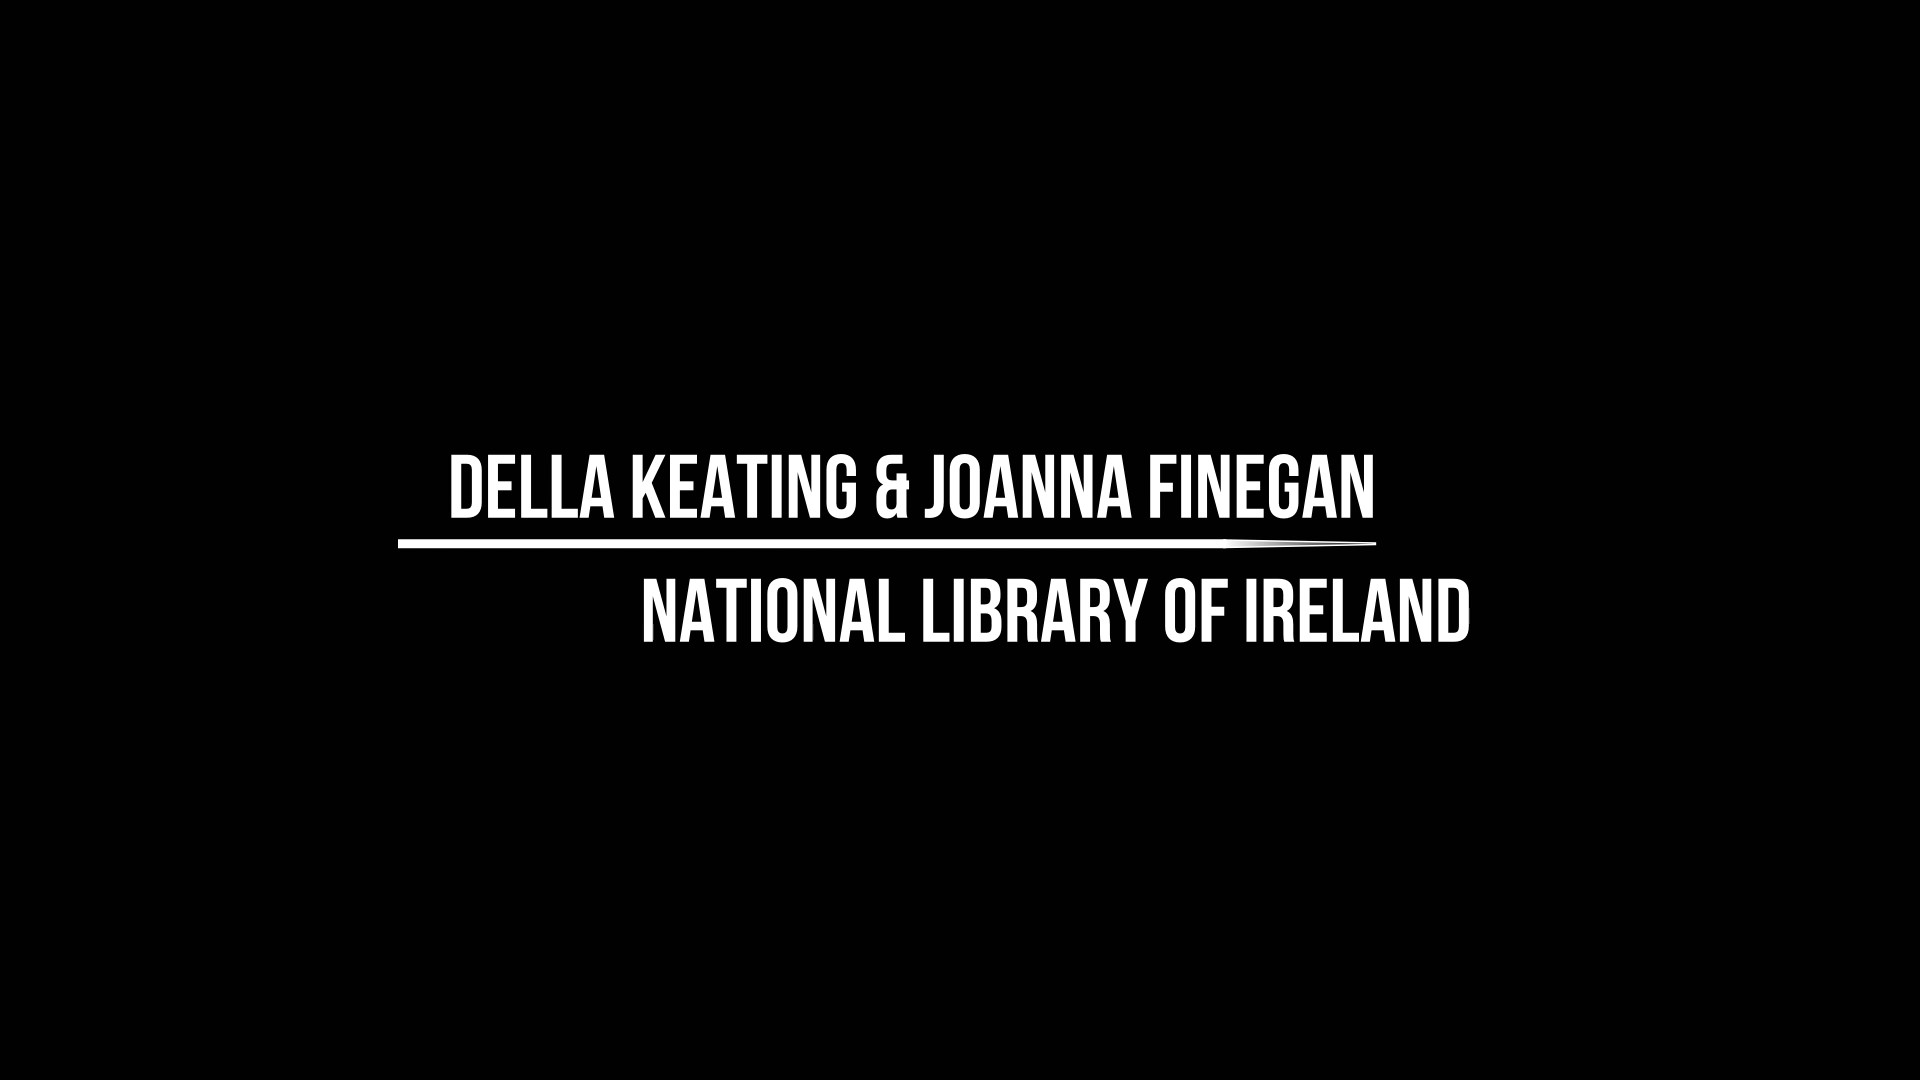 Workshop 1 – Della Keating & Joanna Finegan – Web archives & access: an Irish Perspective